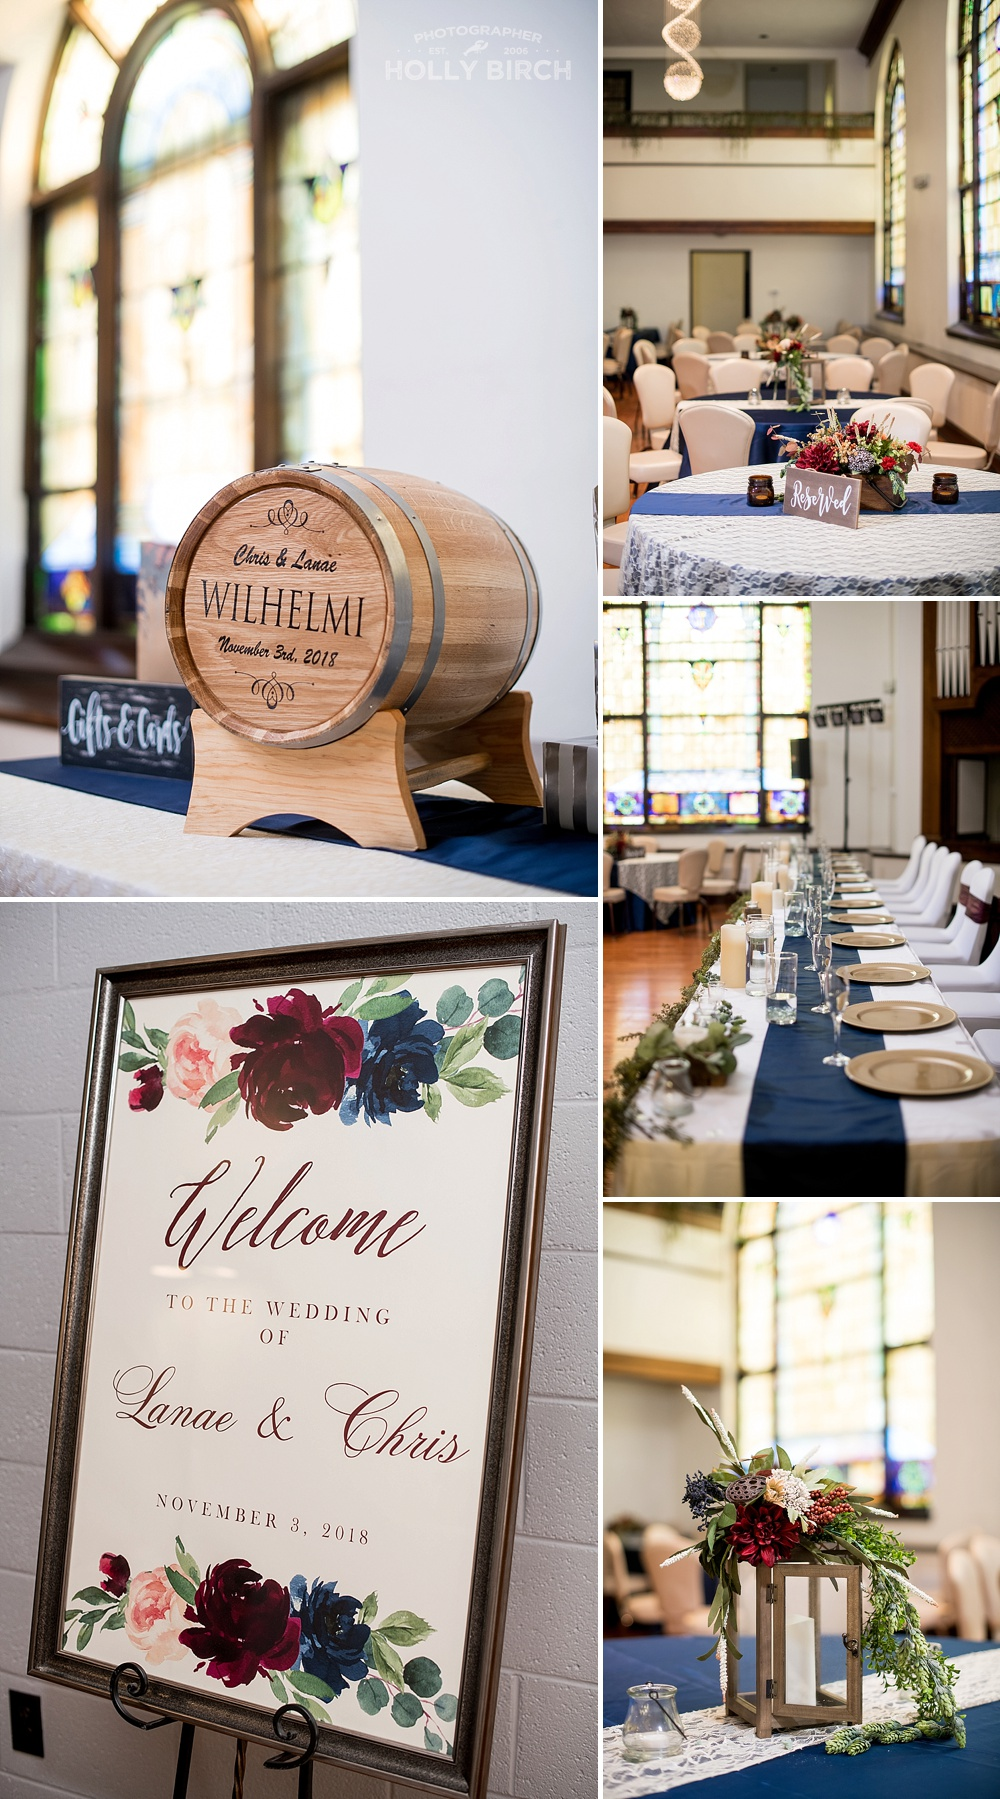 Taylorville-PIllars-Event-Center-fall-farm-wedding-with-corn_4145.jpg